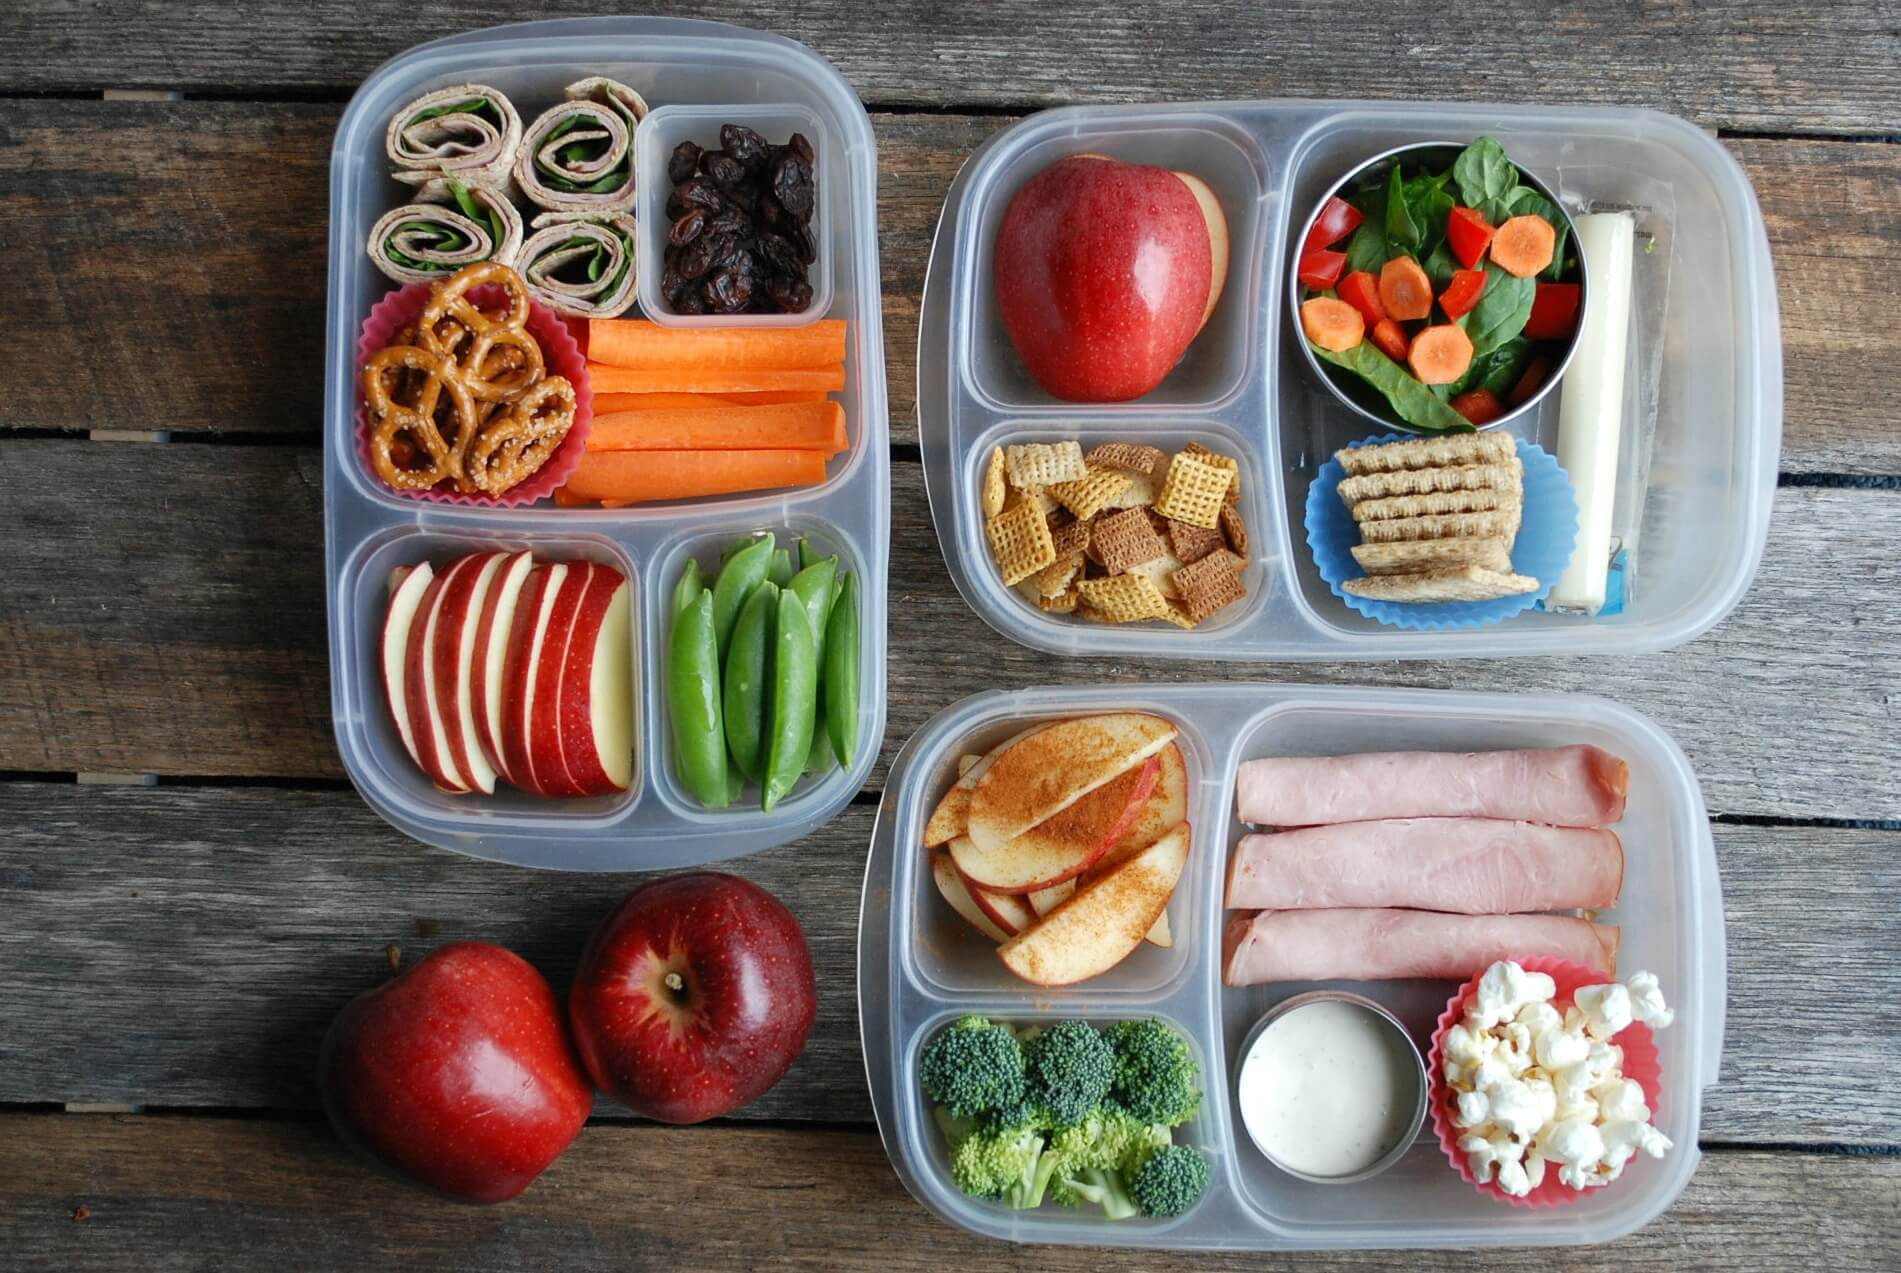 Healthy Bento Box Lunches  Building a Healthy Bento Lunch Box